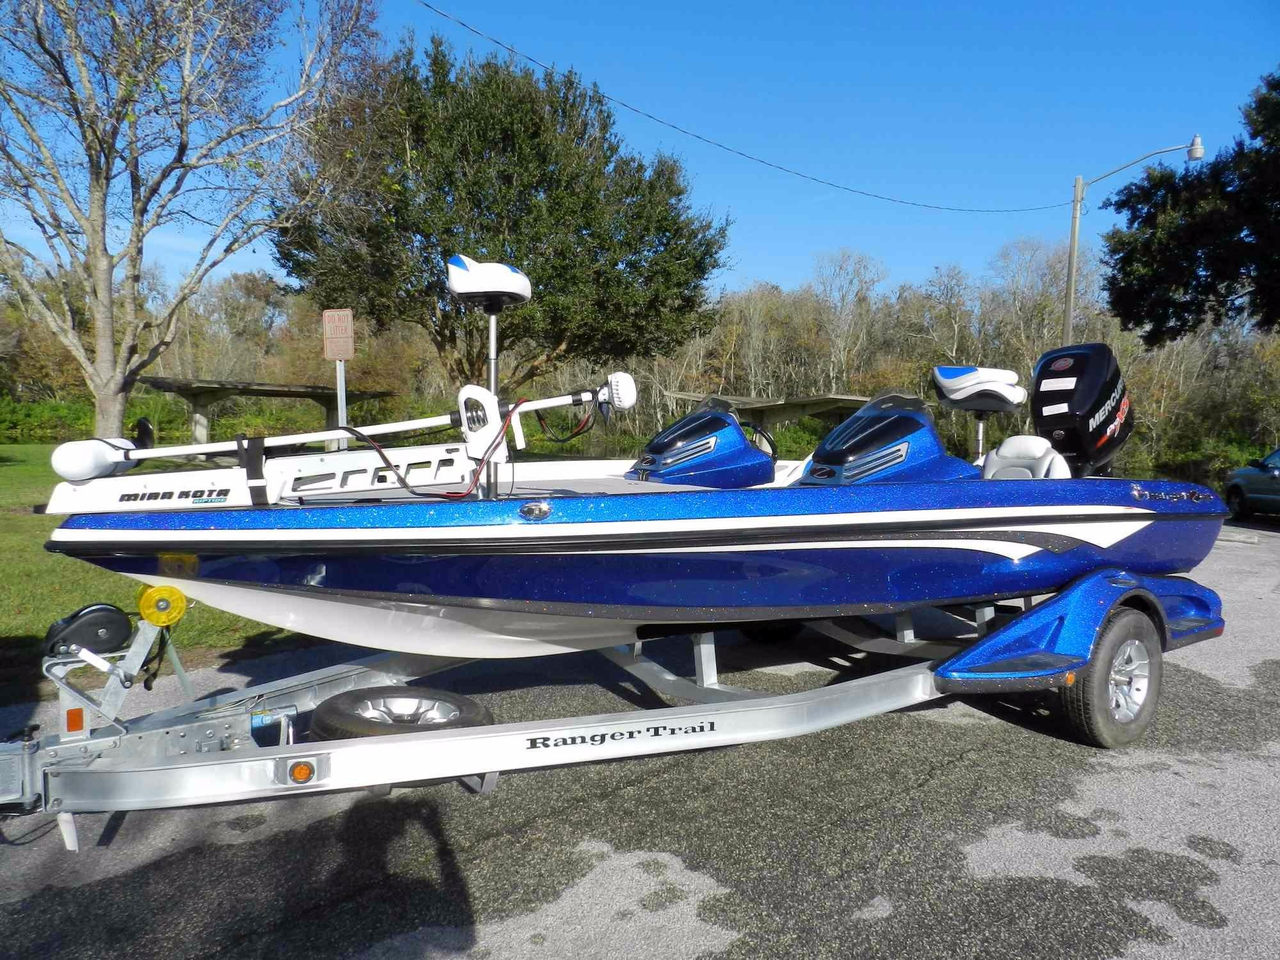 2016 new ranger z518c intracoastal freshwater fishing boat for Freshwater fishing boats